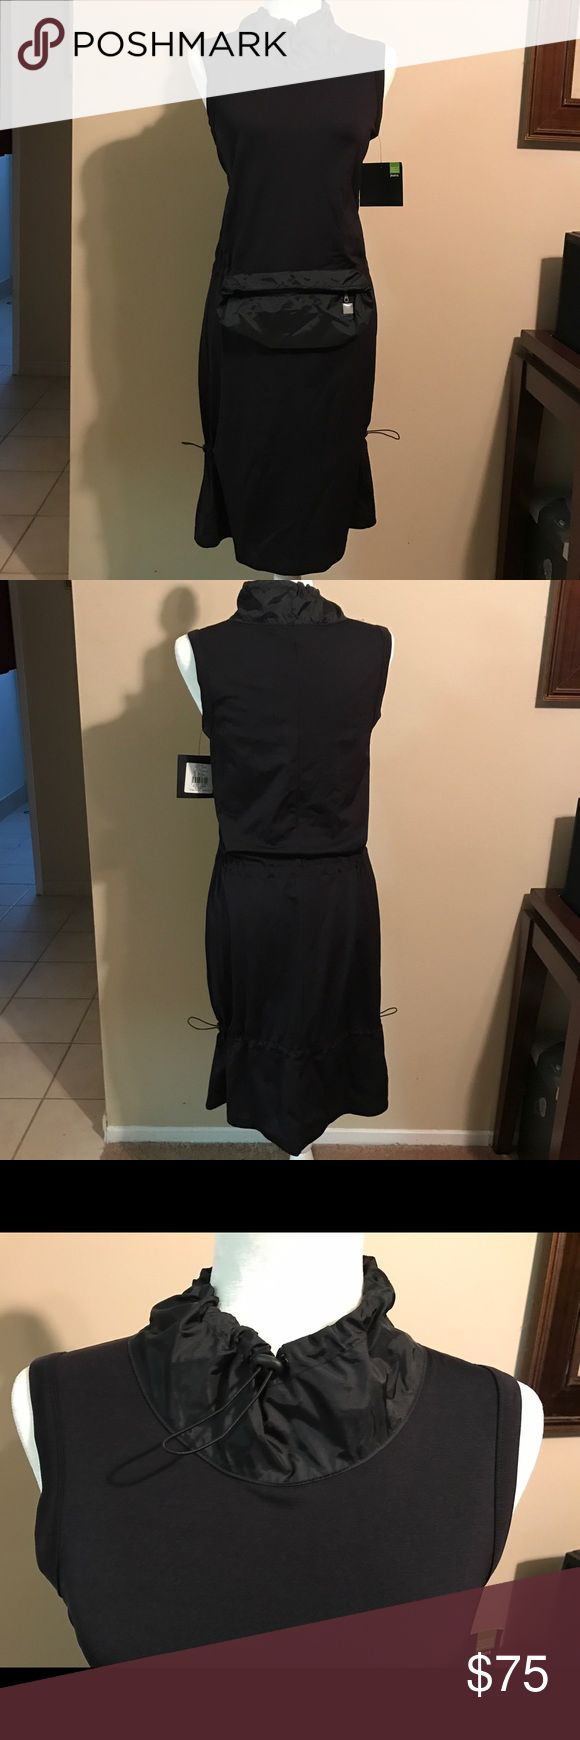 Black dress jeans girbaud